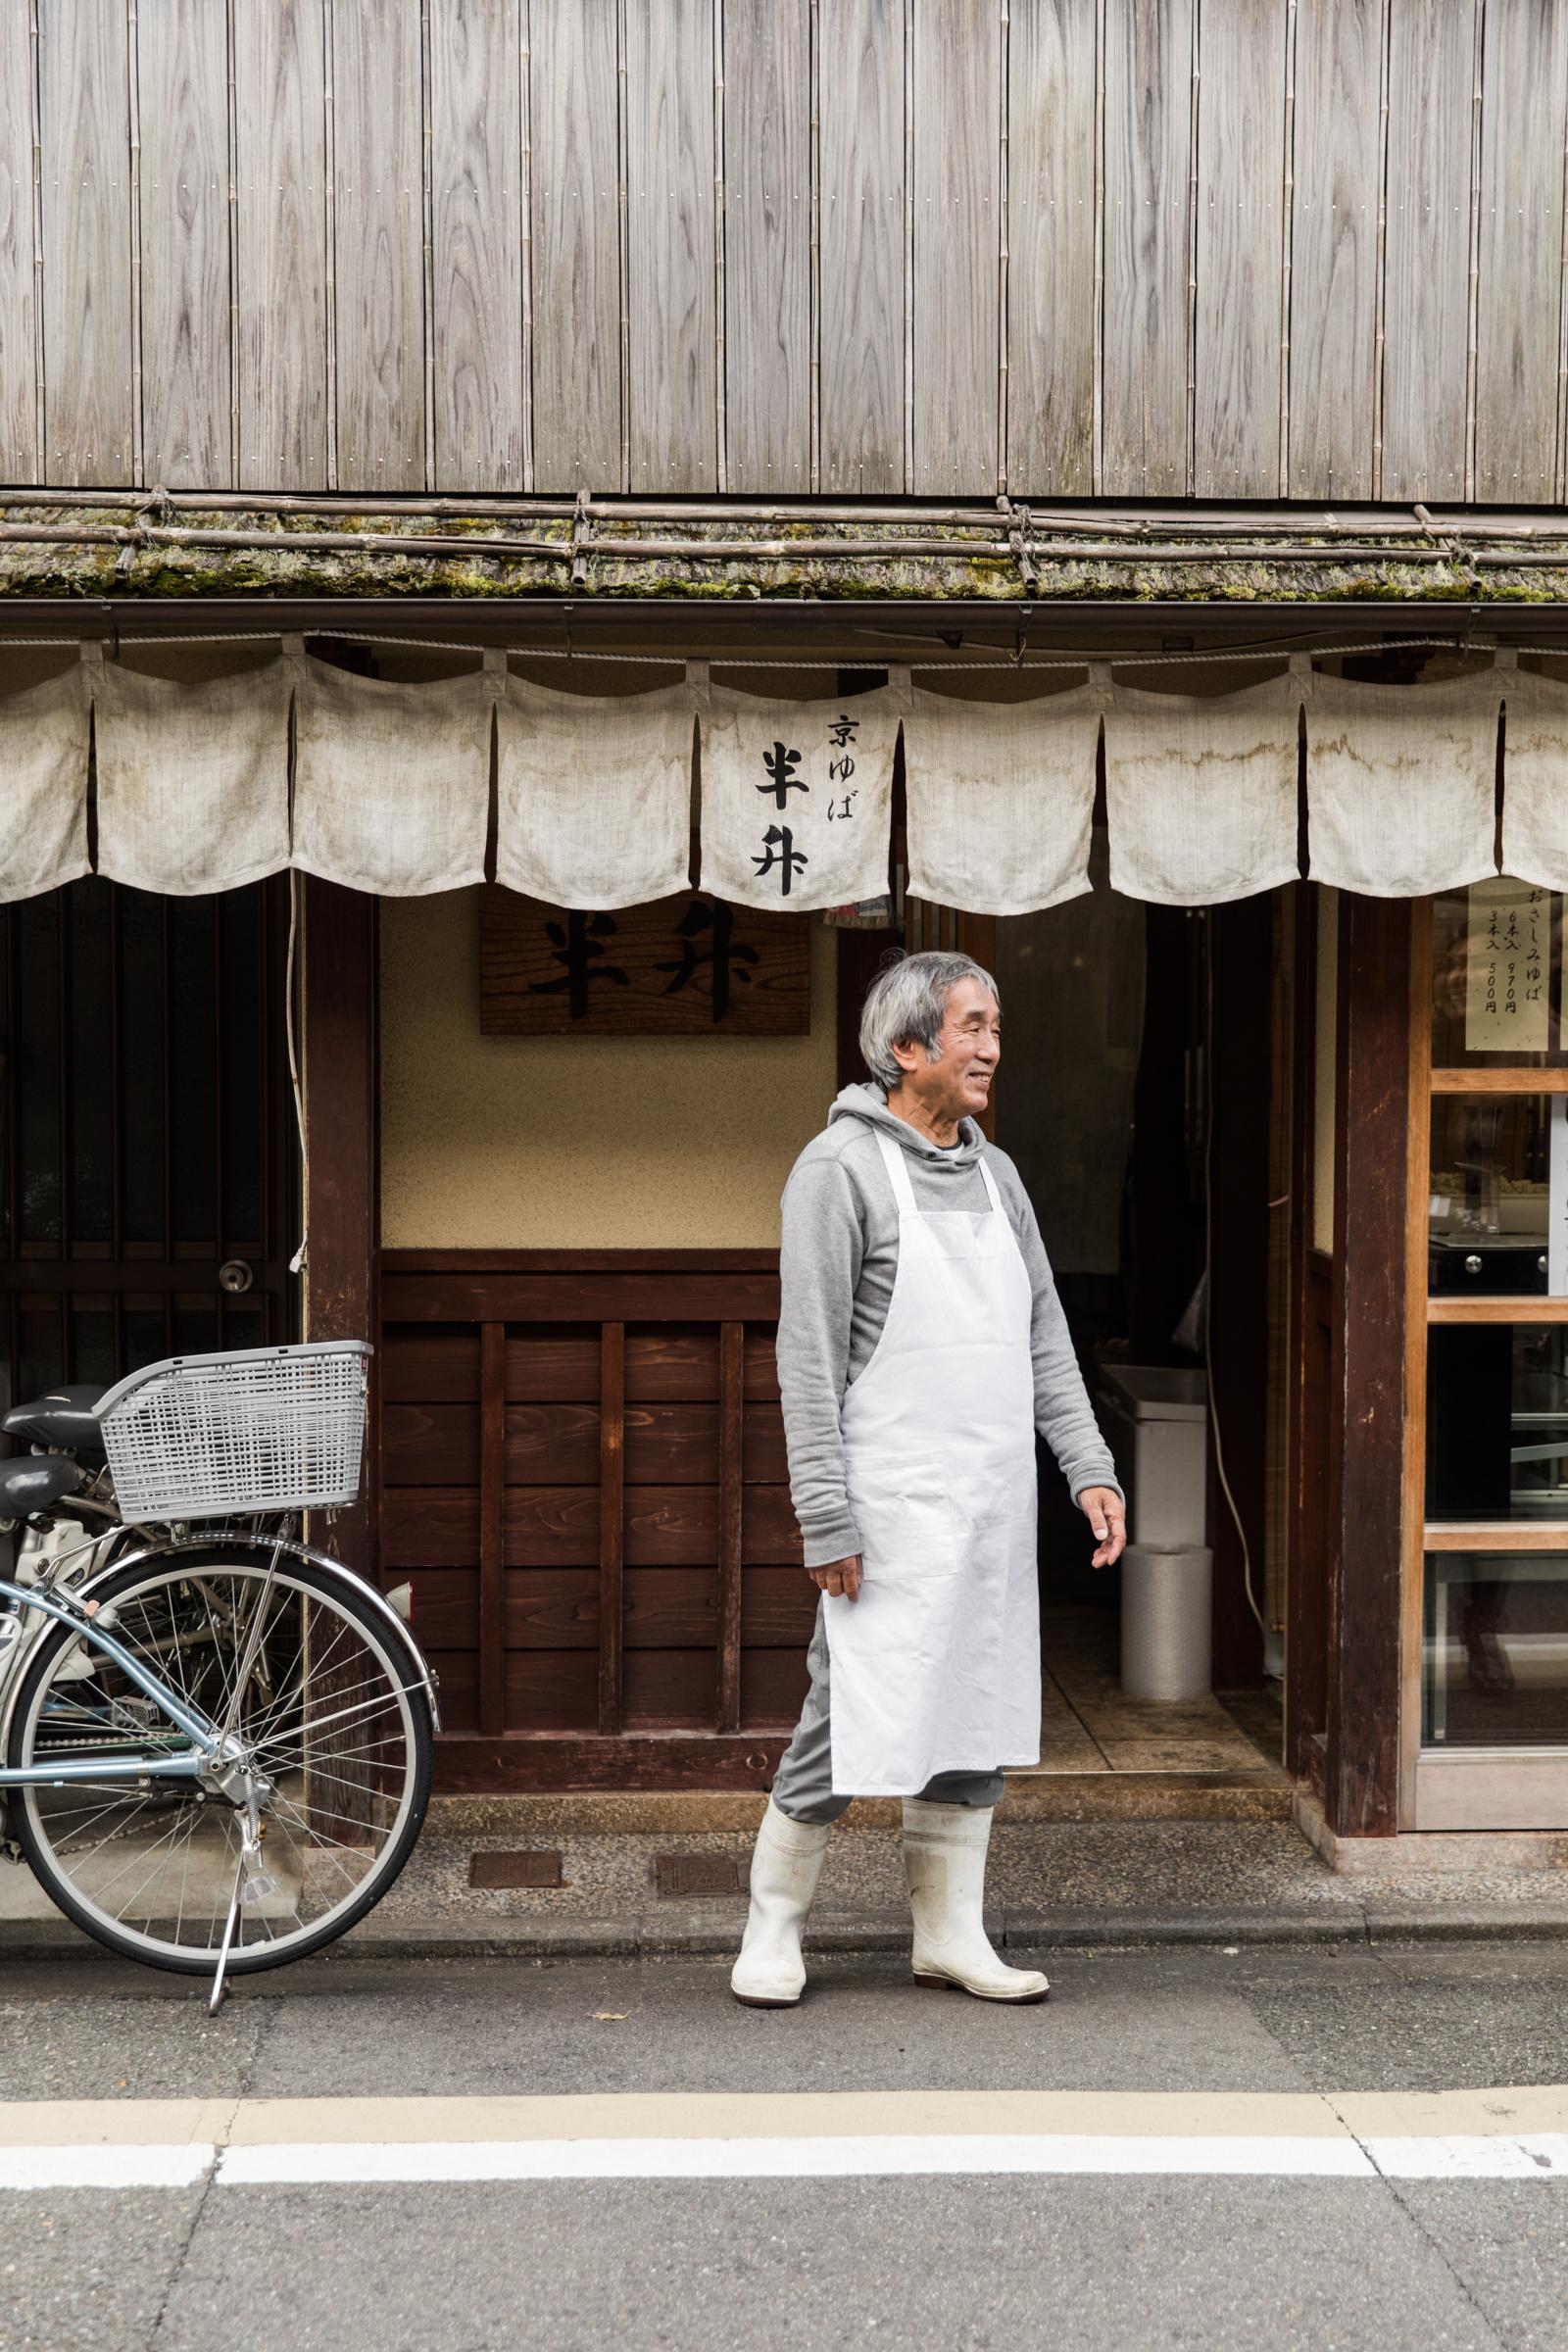 GRybus-Blog-Japan-001-1604.jpg